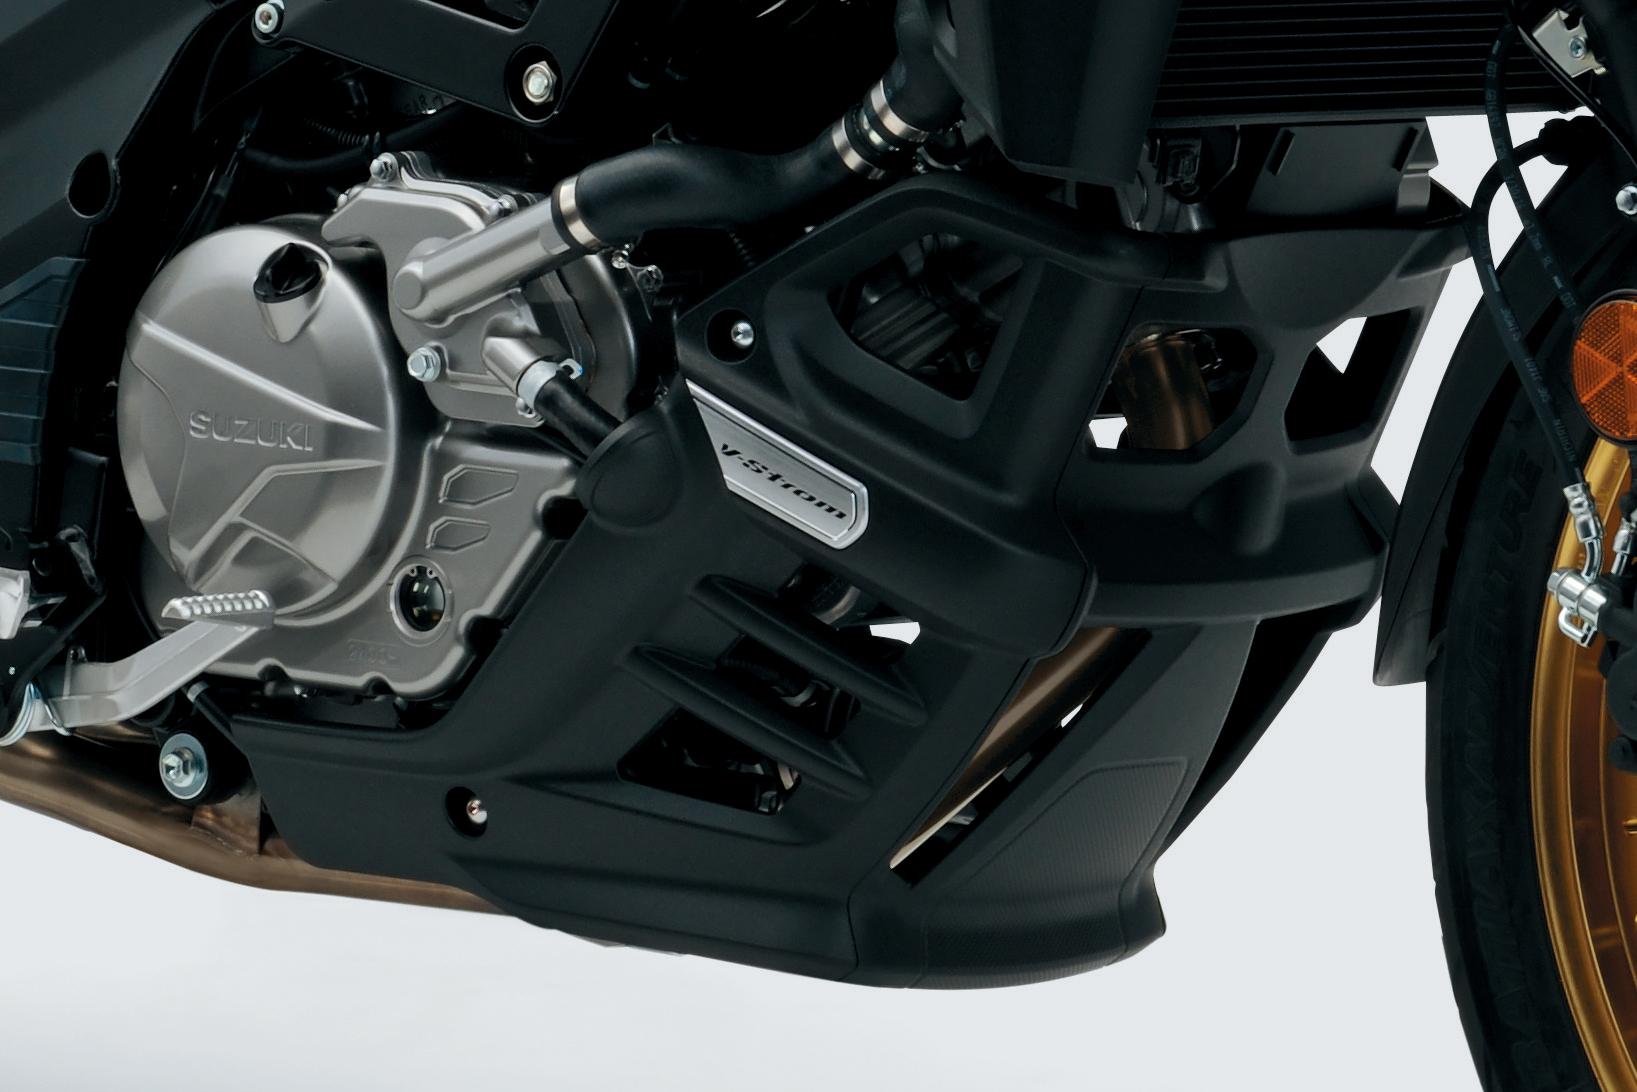 Suzuki V-Strom 650 and V-Strom 1000 first ride review - RevZilla